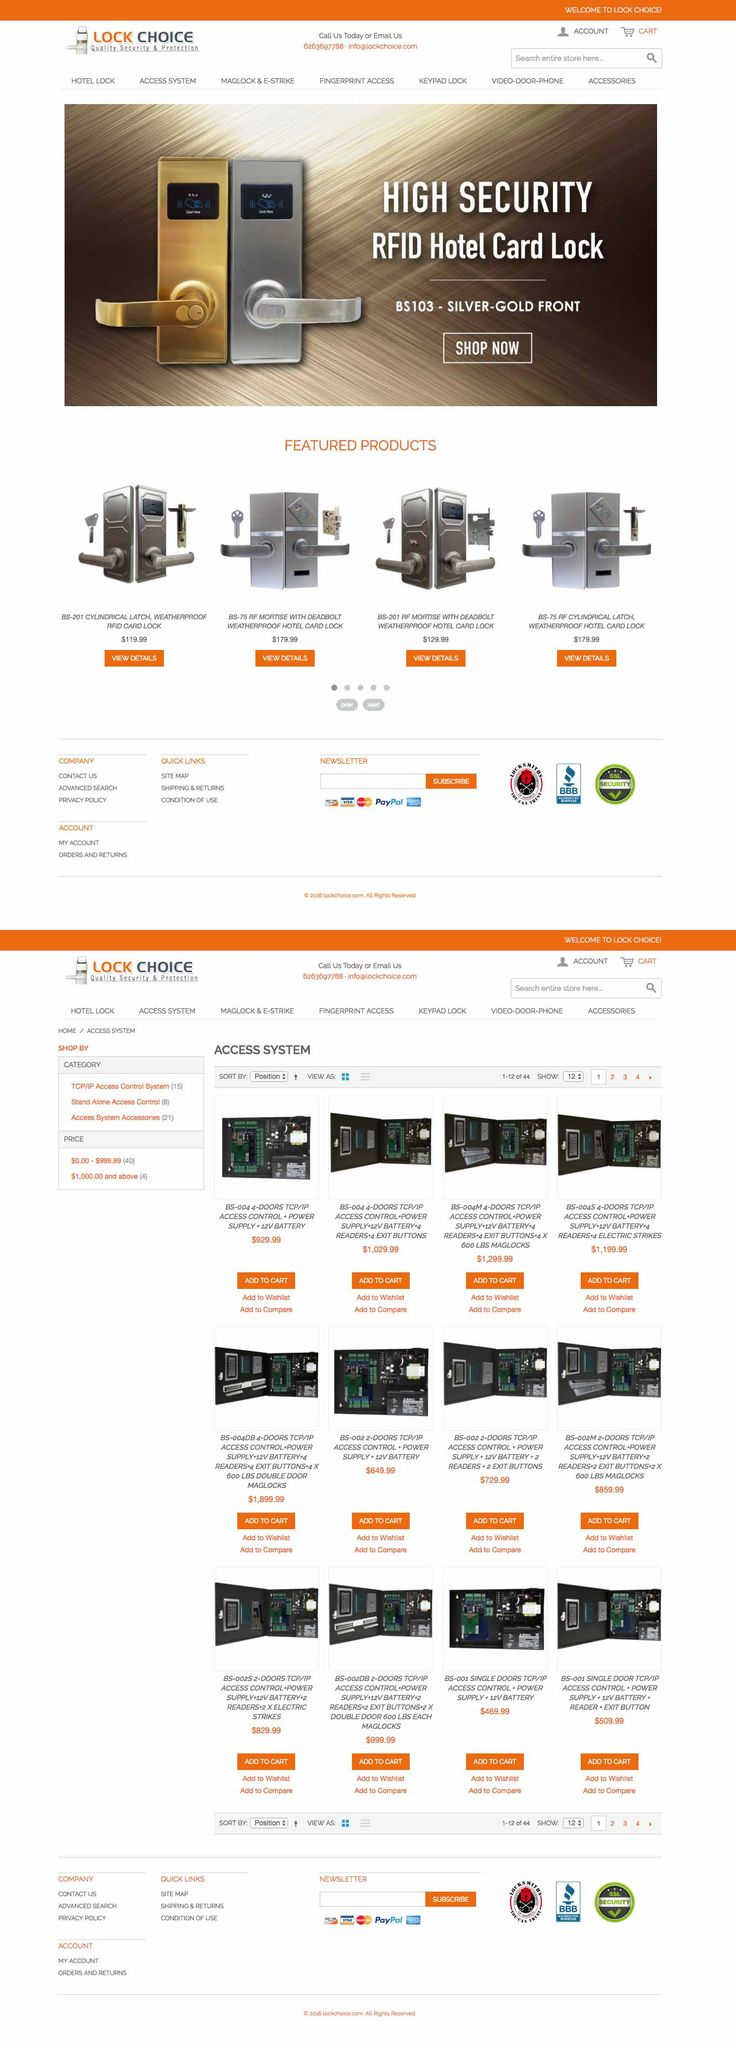 #OODDA #website #design #profolio #marketing #host #maintenance #Magento #wordpress #online #business #promote  #Lock #Choice #Hotel Locks, #Magnetic Locks, #Keypad Locks  https://www.lockchoice.com/